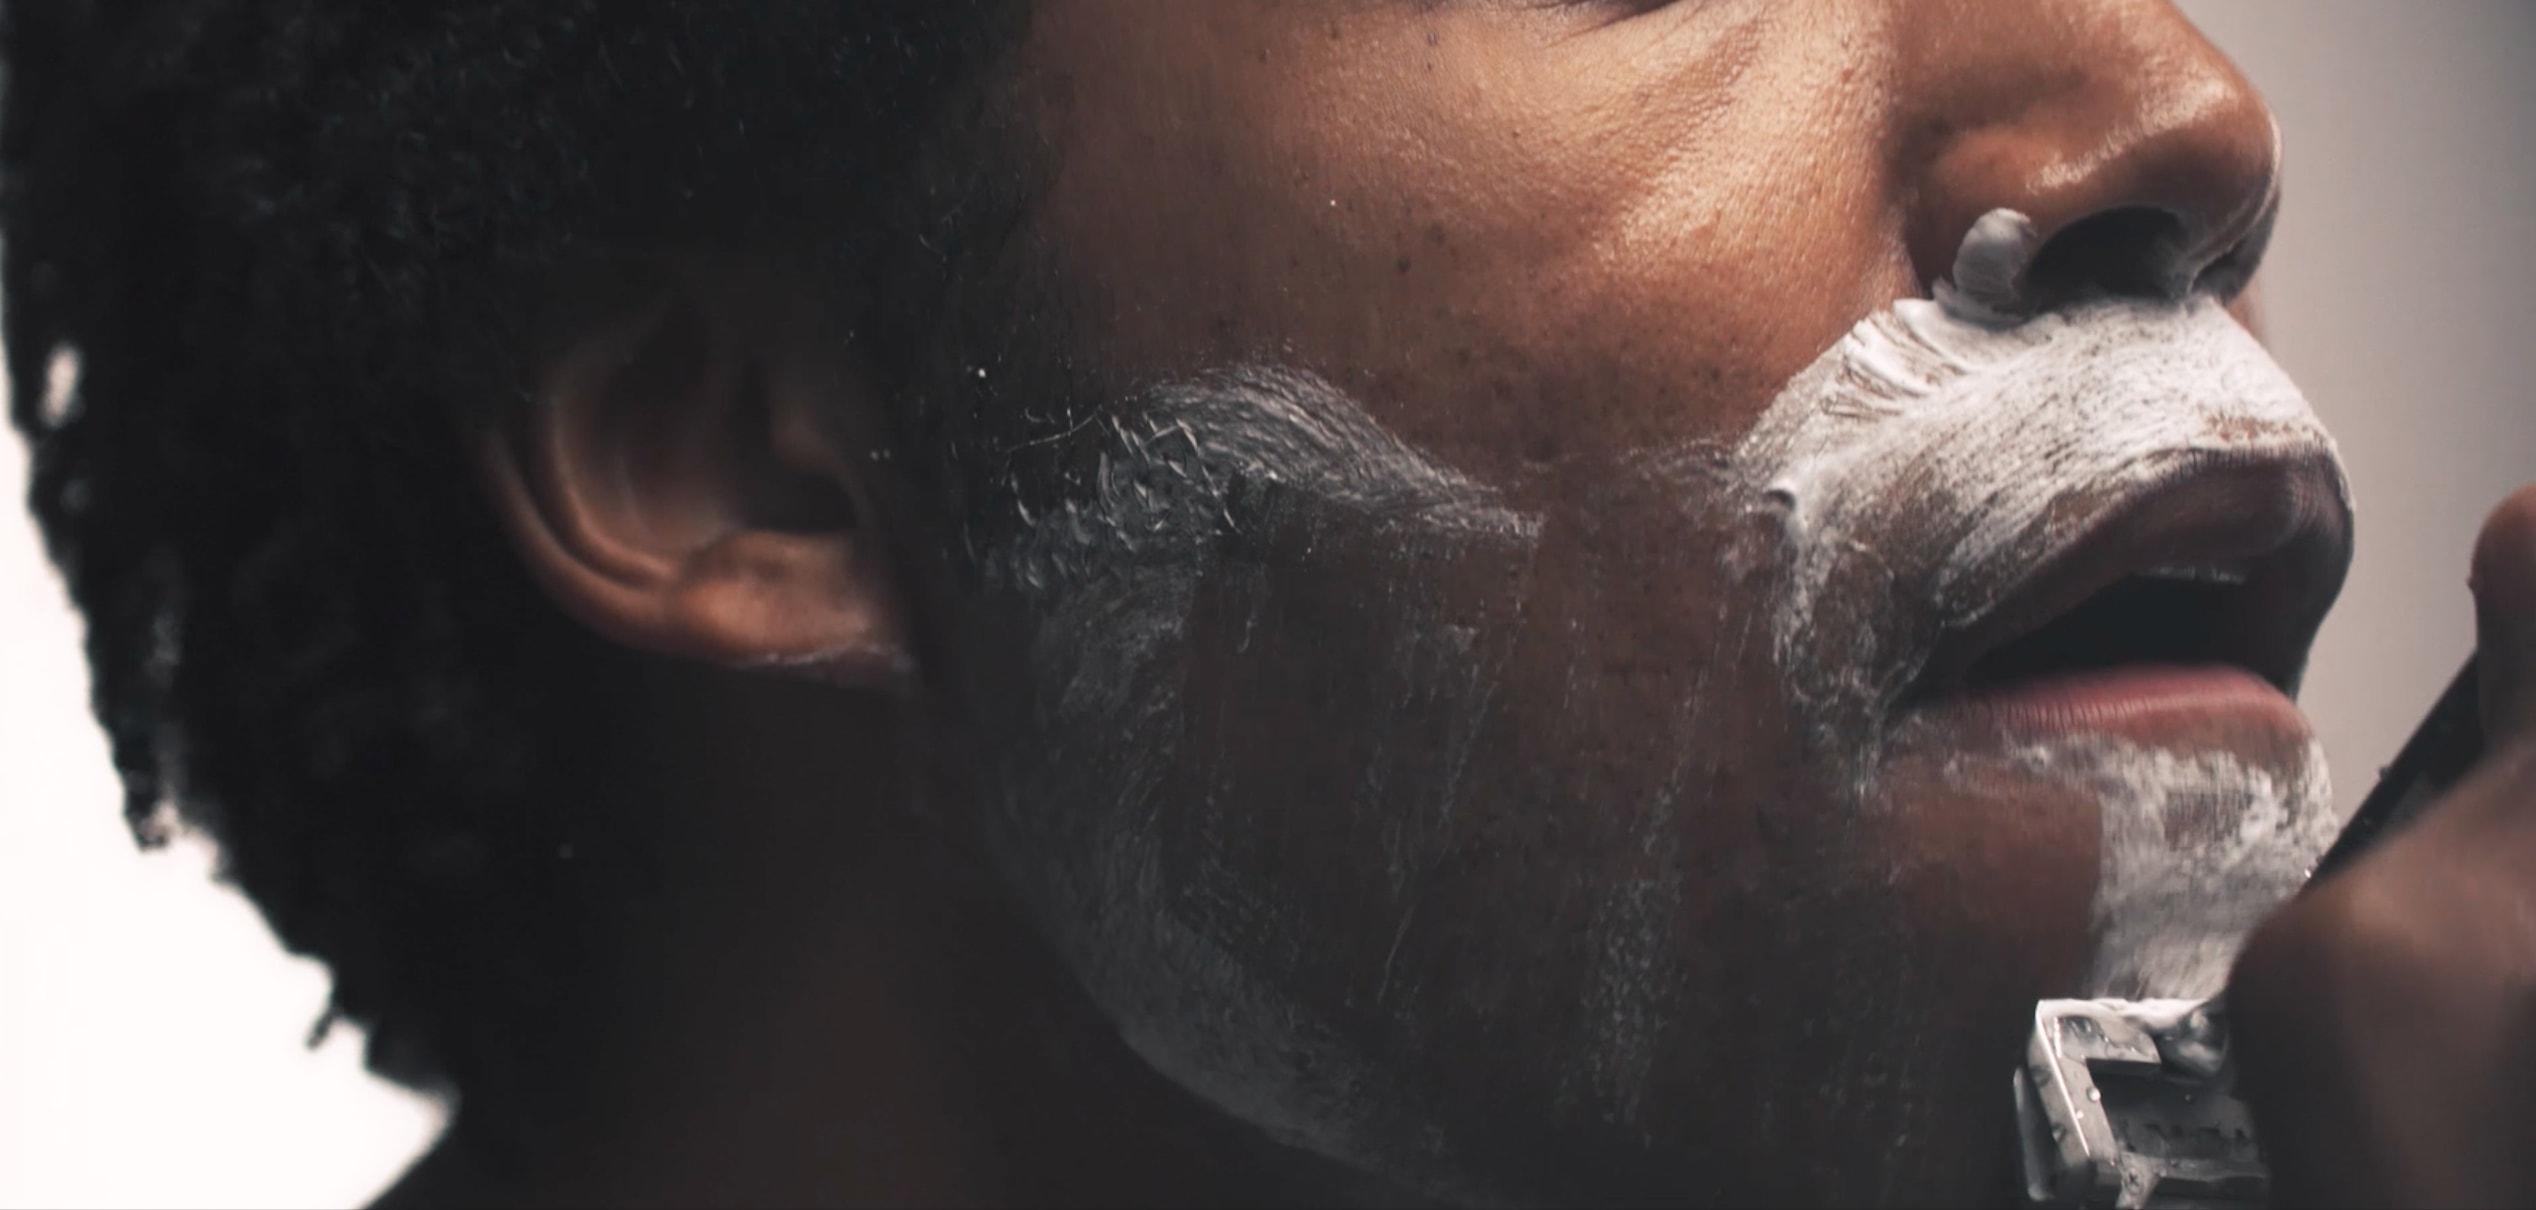 Closeup of a man shaving his chin